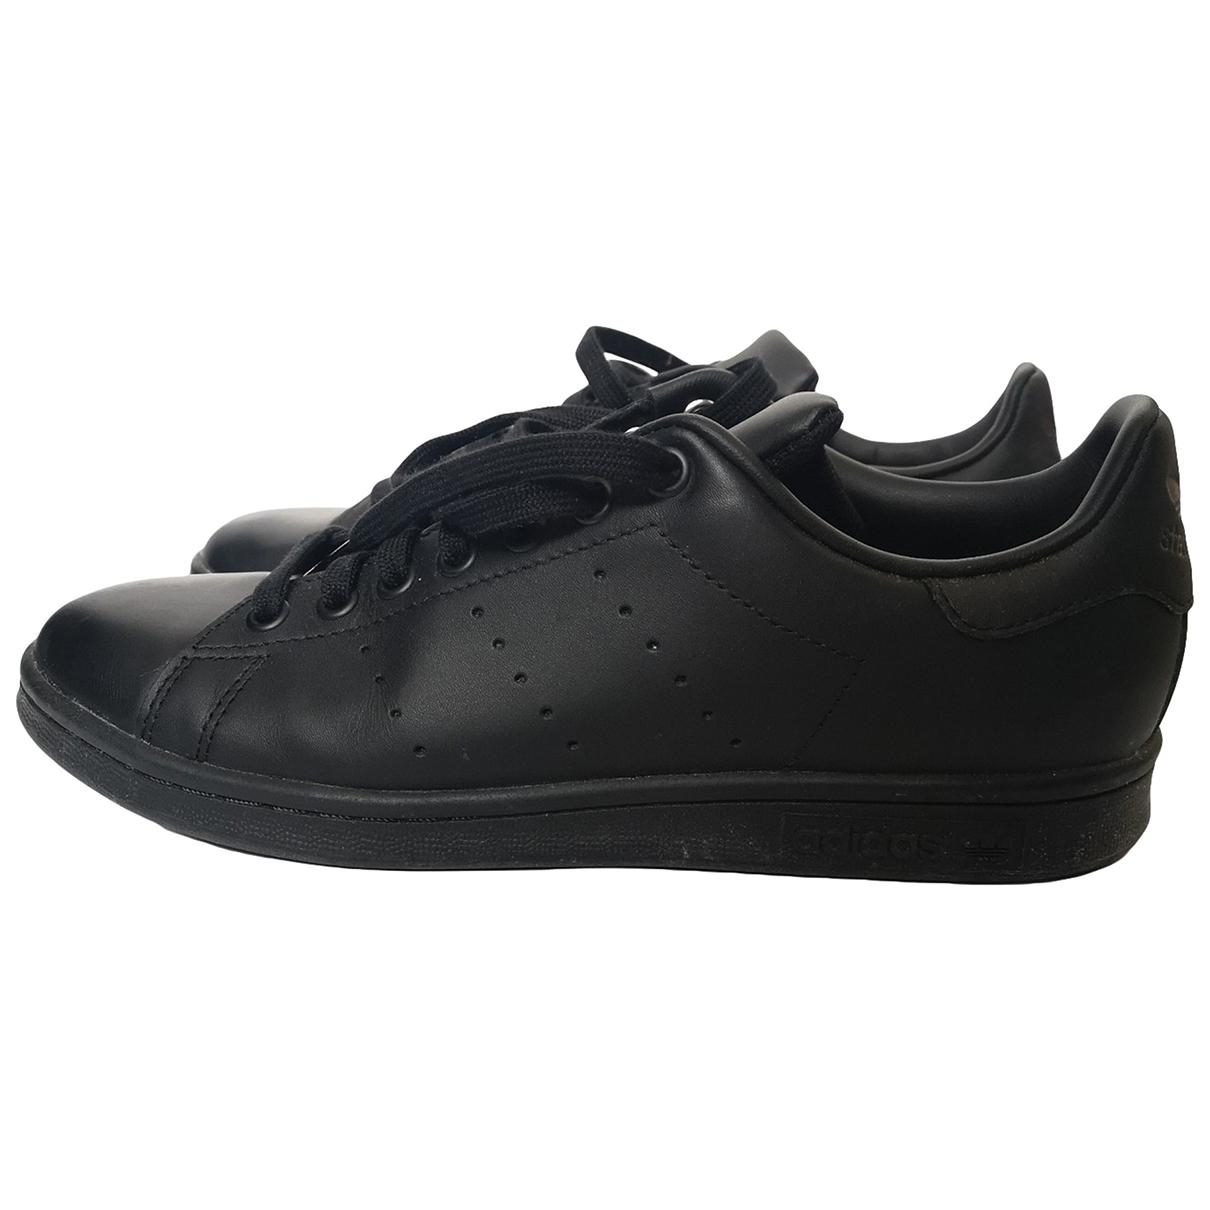 Adidas Stan Smith Sneakers in  Schwarz Leder